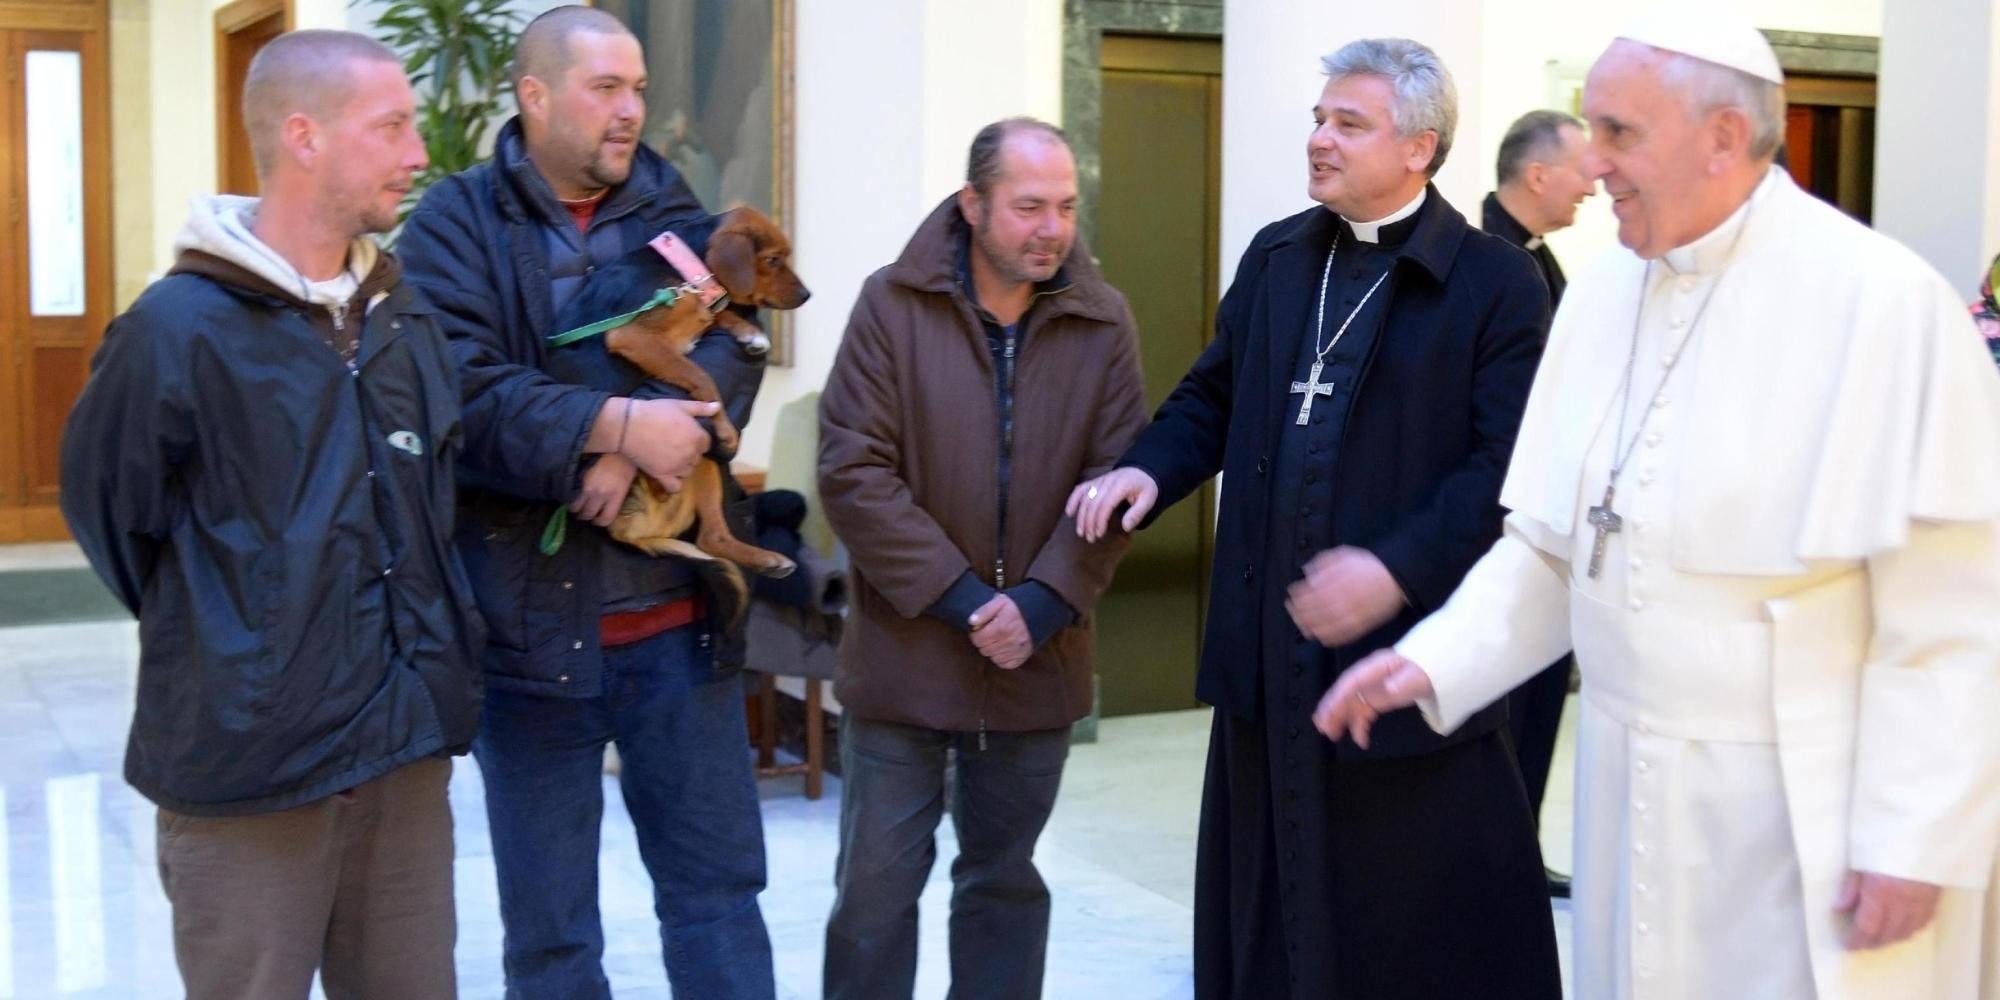 Papa Francesco con i senzatetto  ANSA/ OSSERVATORE ROMANO   +++ HO - NO SALES, EDITORIAL USE ONLY +++